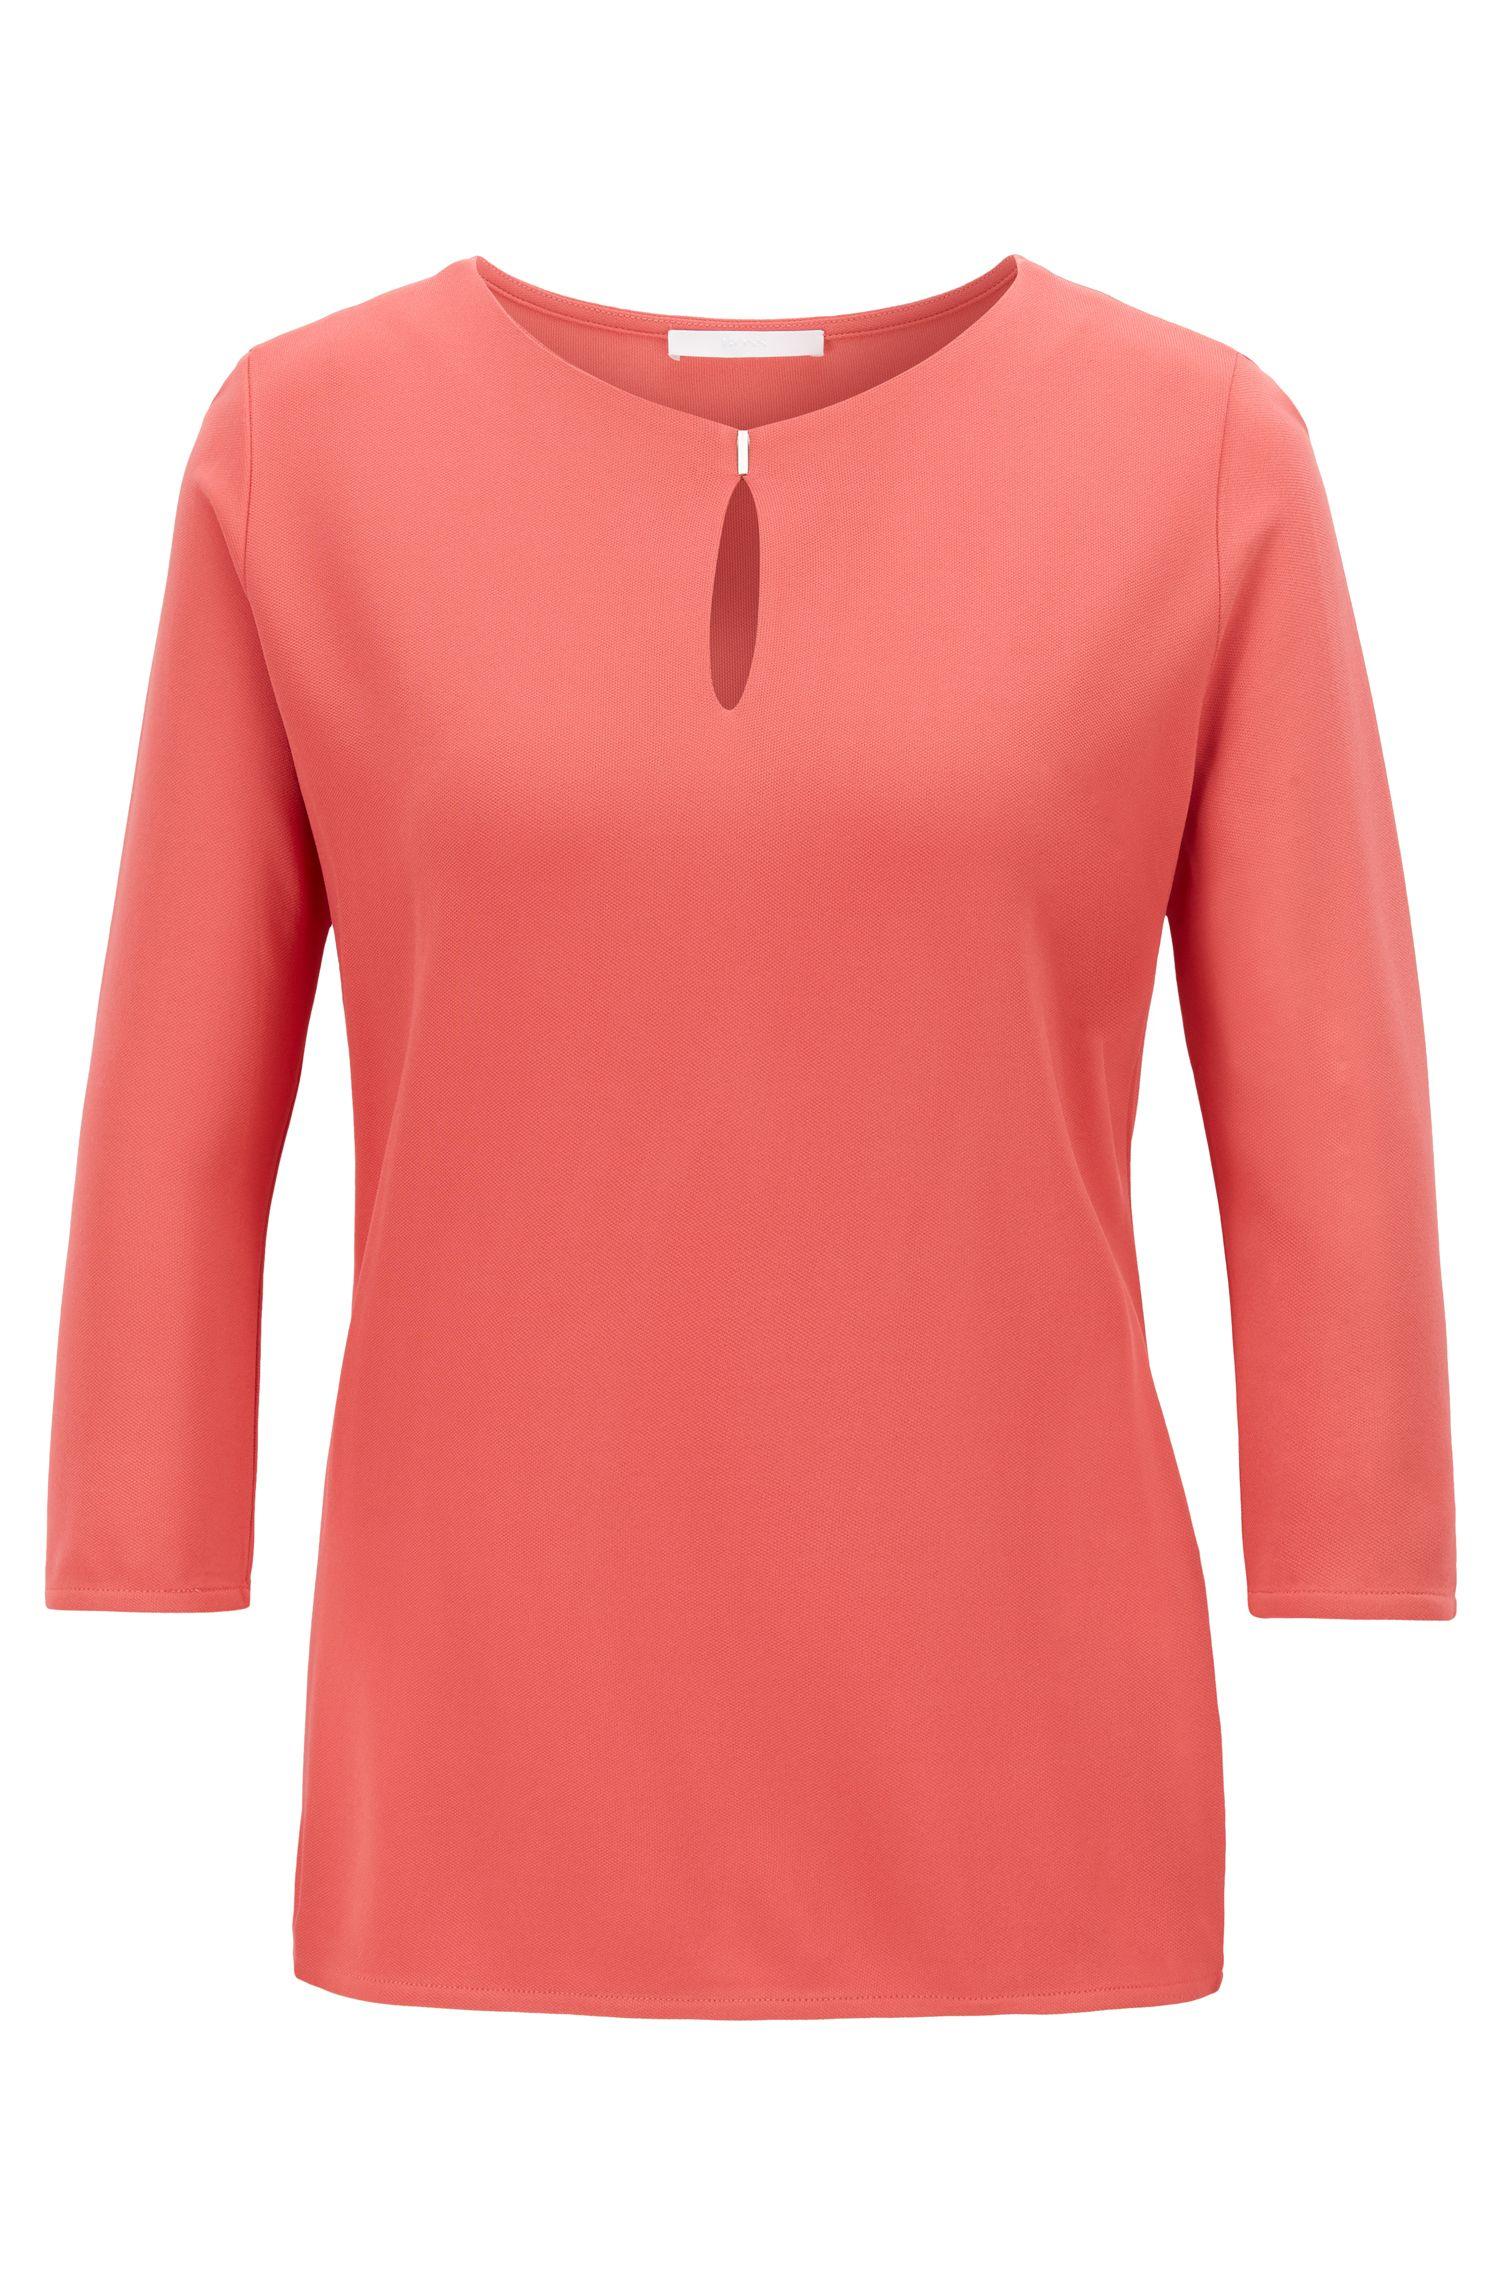 Top aus Krepp-Jersey mit Schlüsselloch-Ausschnitt, Pink